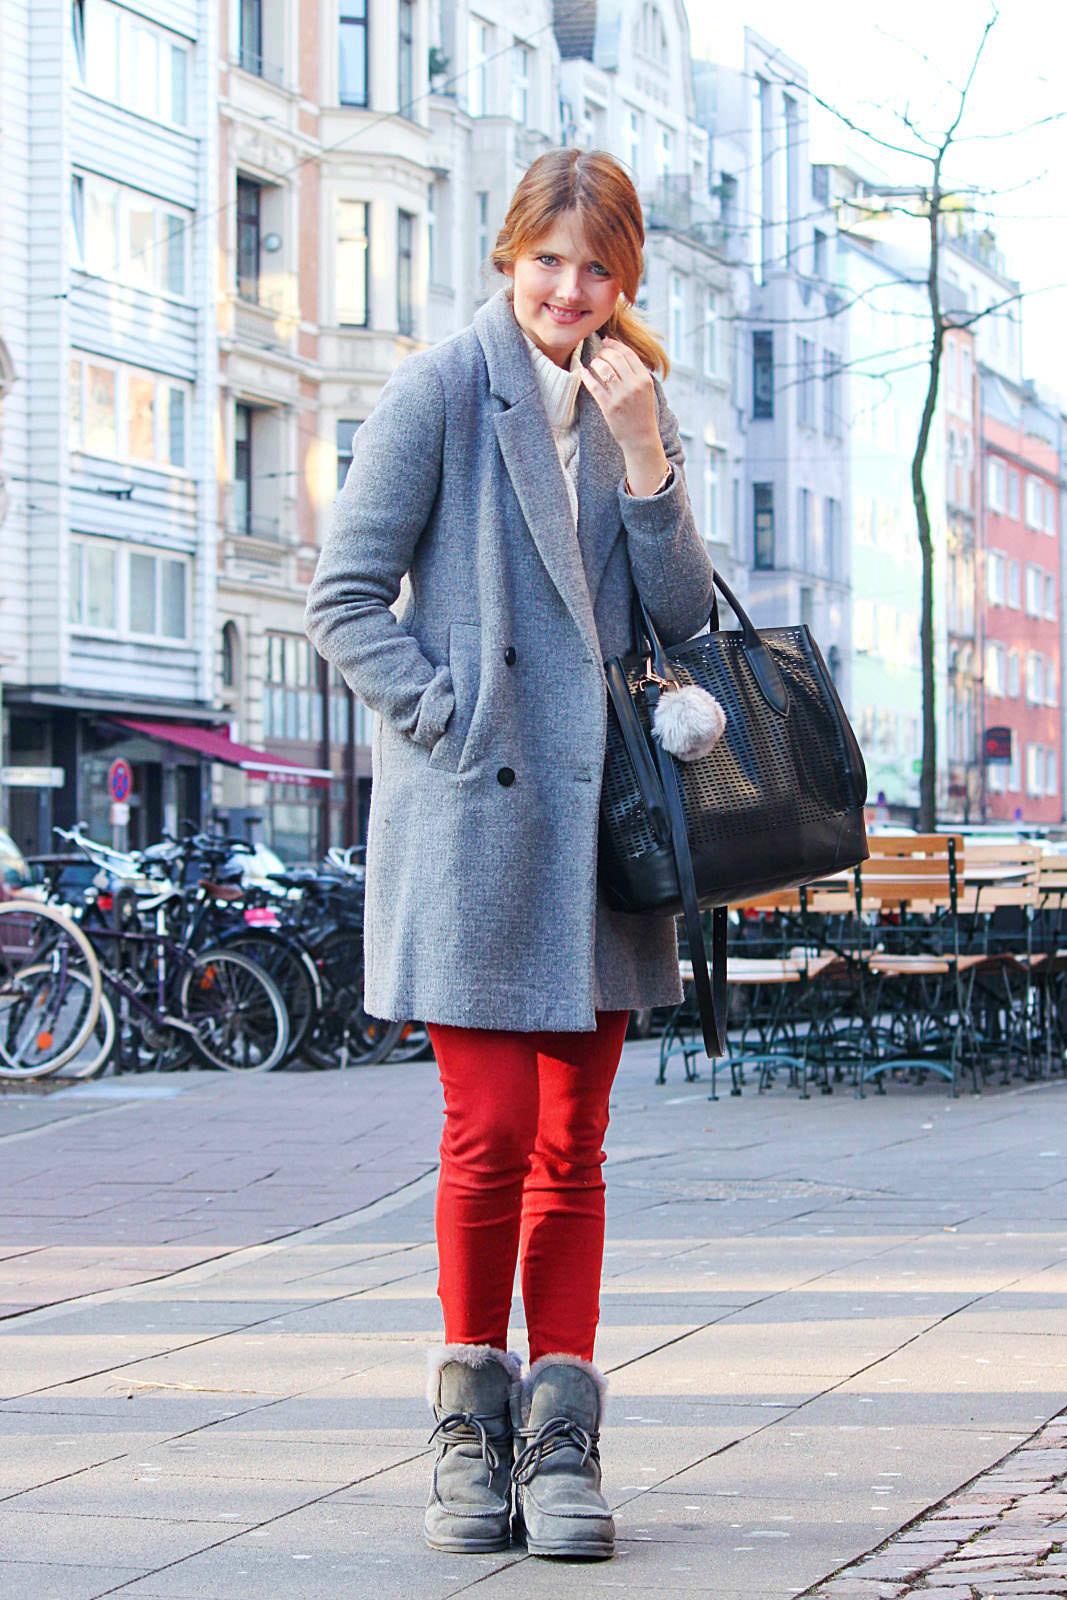 desbelleschoses-modeblog-köln-winterliches-outfit-zum-blogger-brunch-in-köln 1